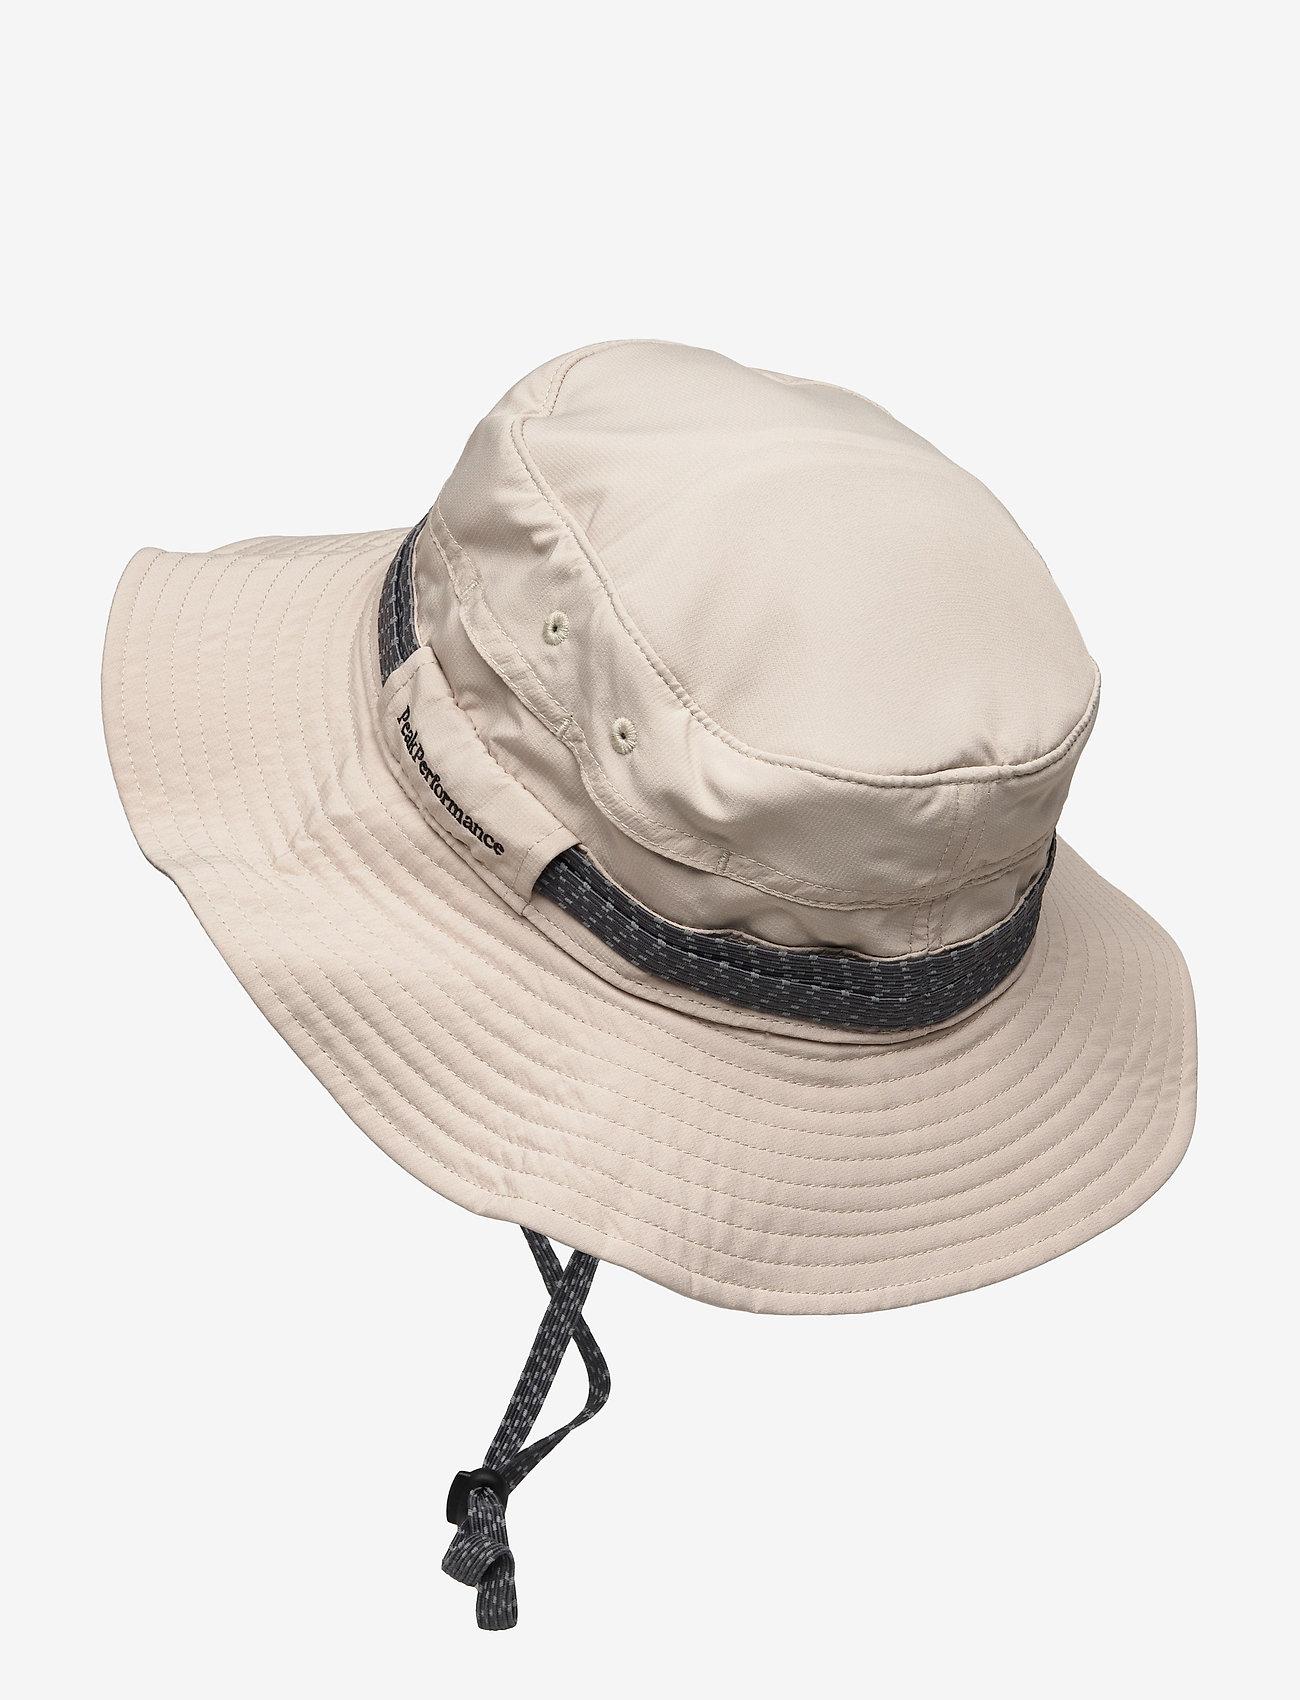 Peak Performance - Safari Hat - true beige - 1